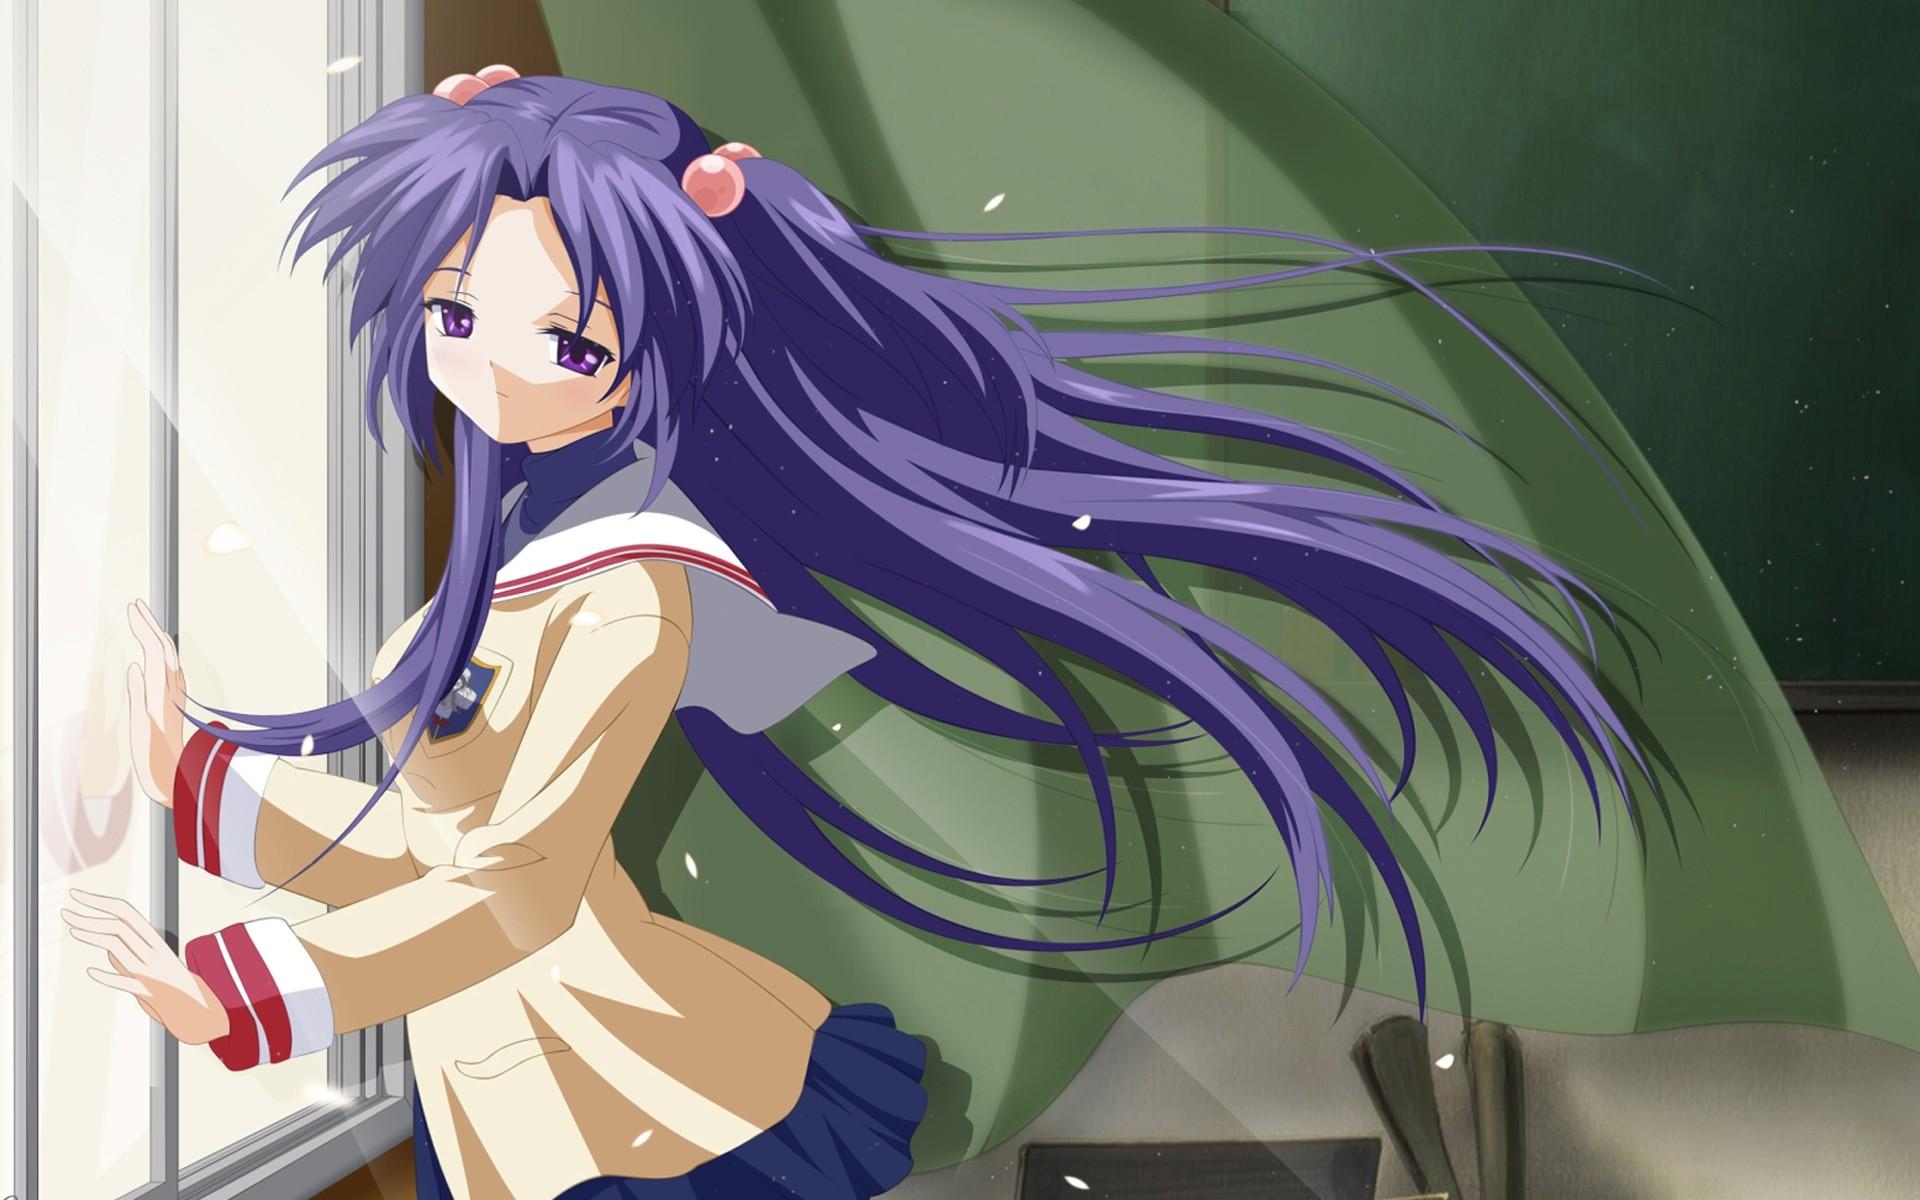 Anime 1920x1200 anime girls anime Clannad Ichinose Kotomi purple hair purple eyes Open Windows long hair windy women indoors